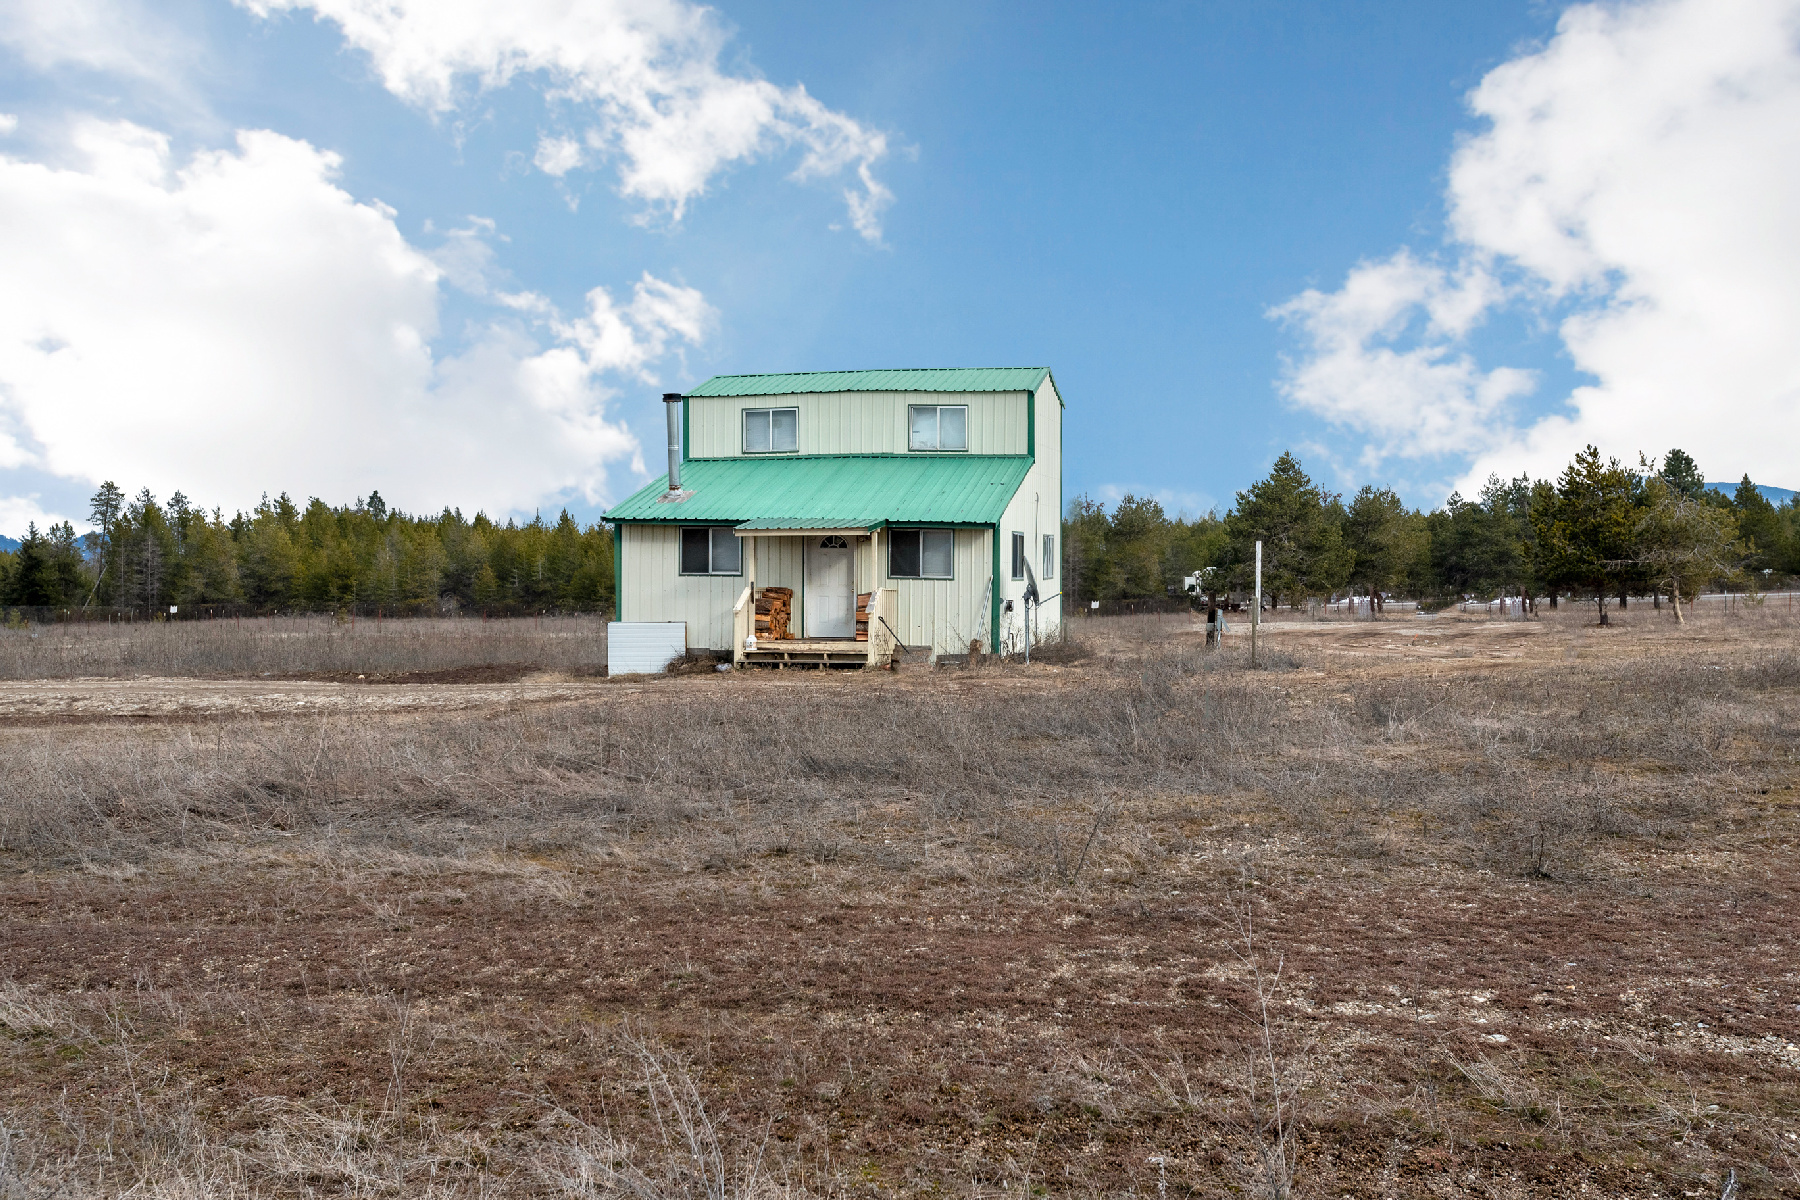 Single Family Homes for Sale at Attention Investors 6823 E Trinity Athol, Idaho 83801 United States